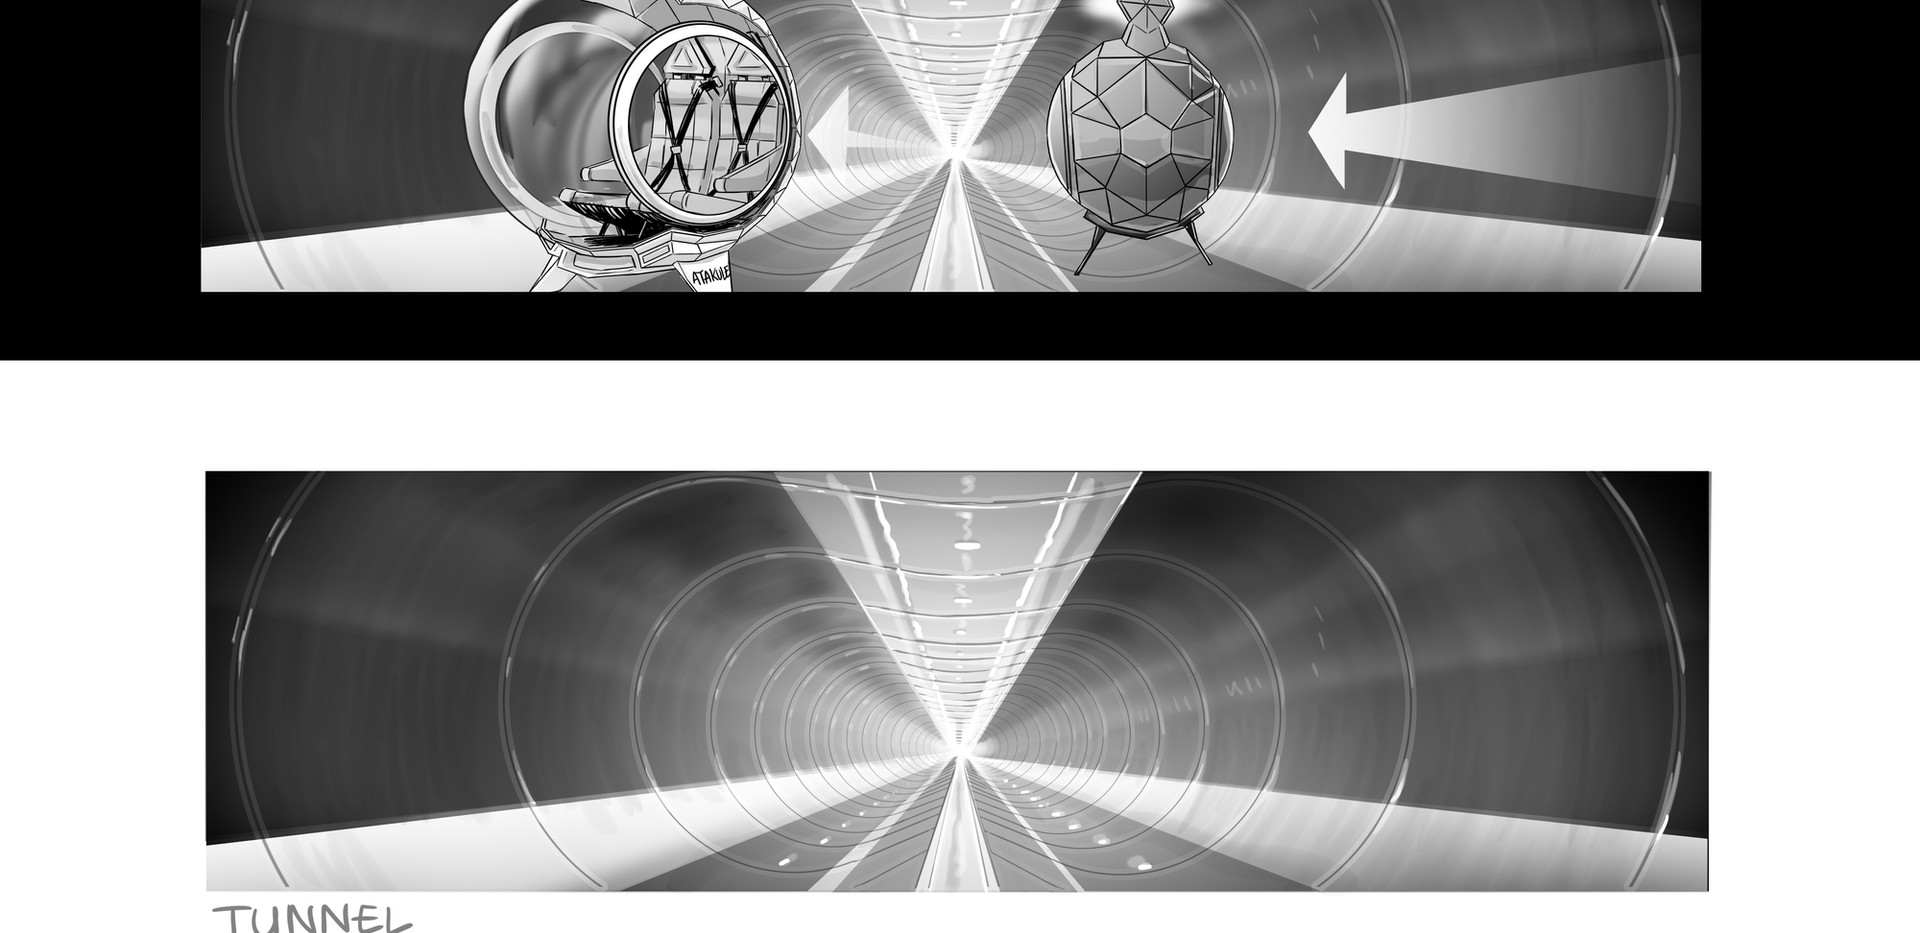 Tunnel concept